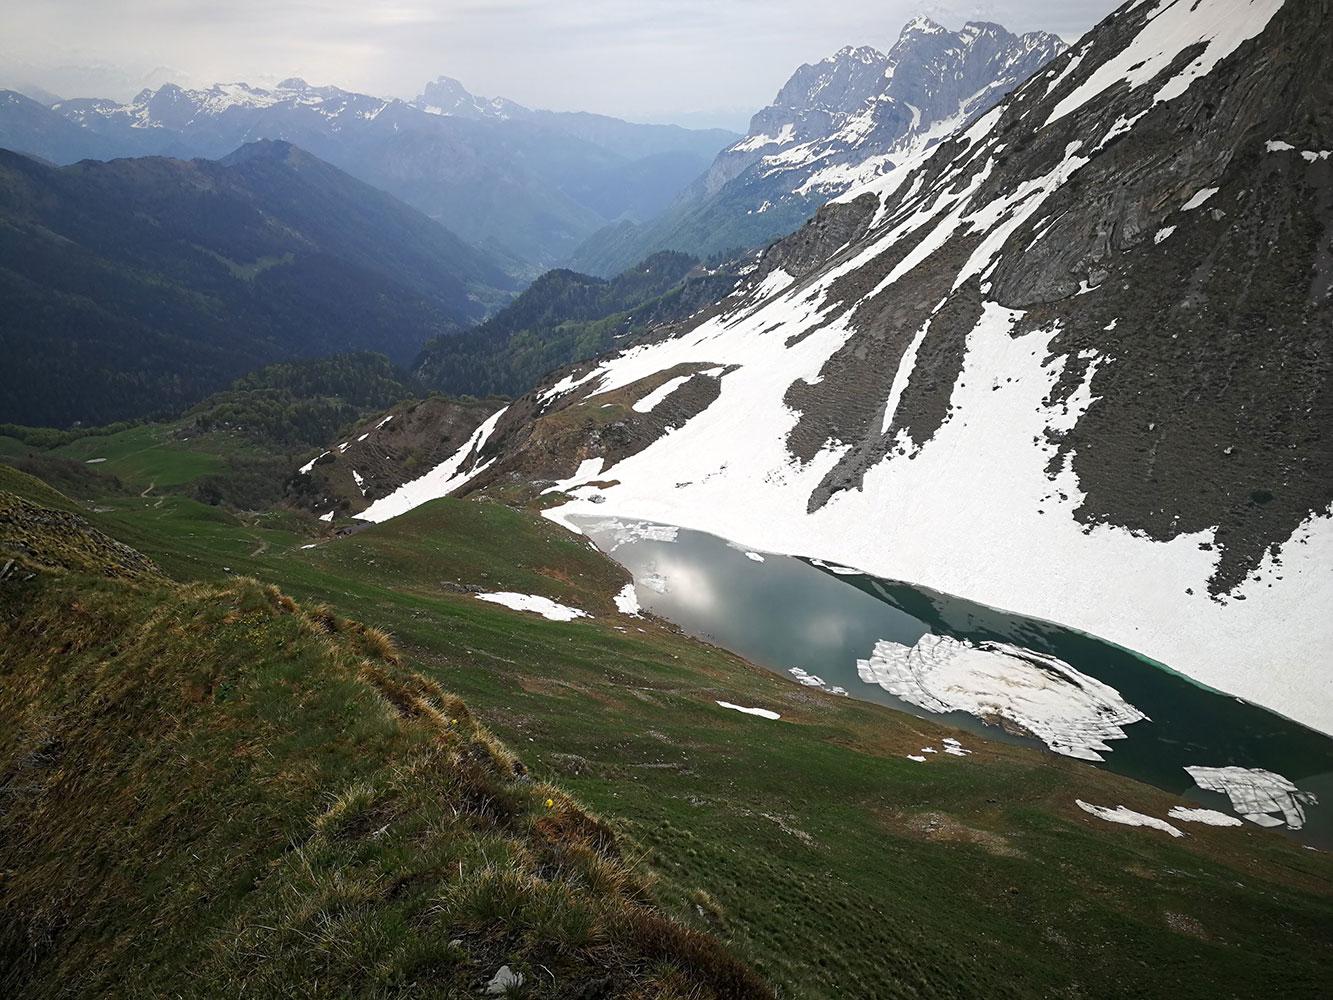 lago branchino vista aerea